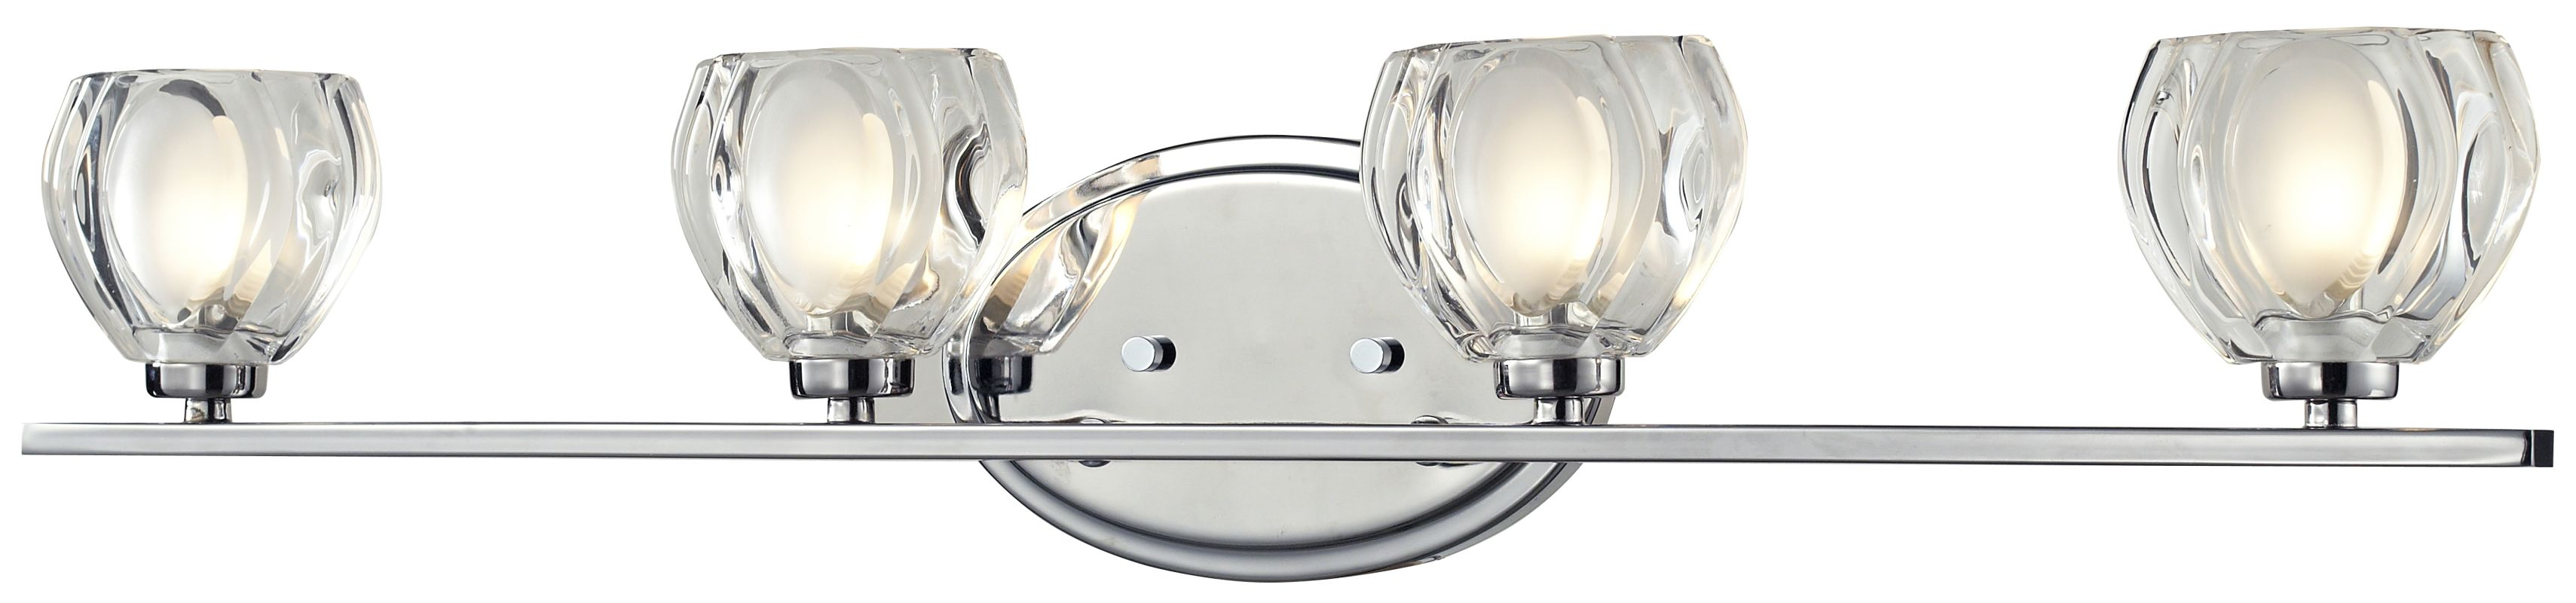 Z-Lite 3023-4V Hale 4 Light ADA Compliant Bathroom Vanity Light with